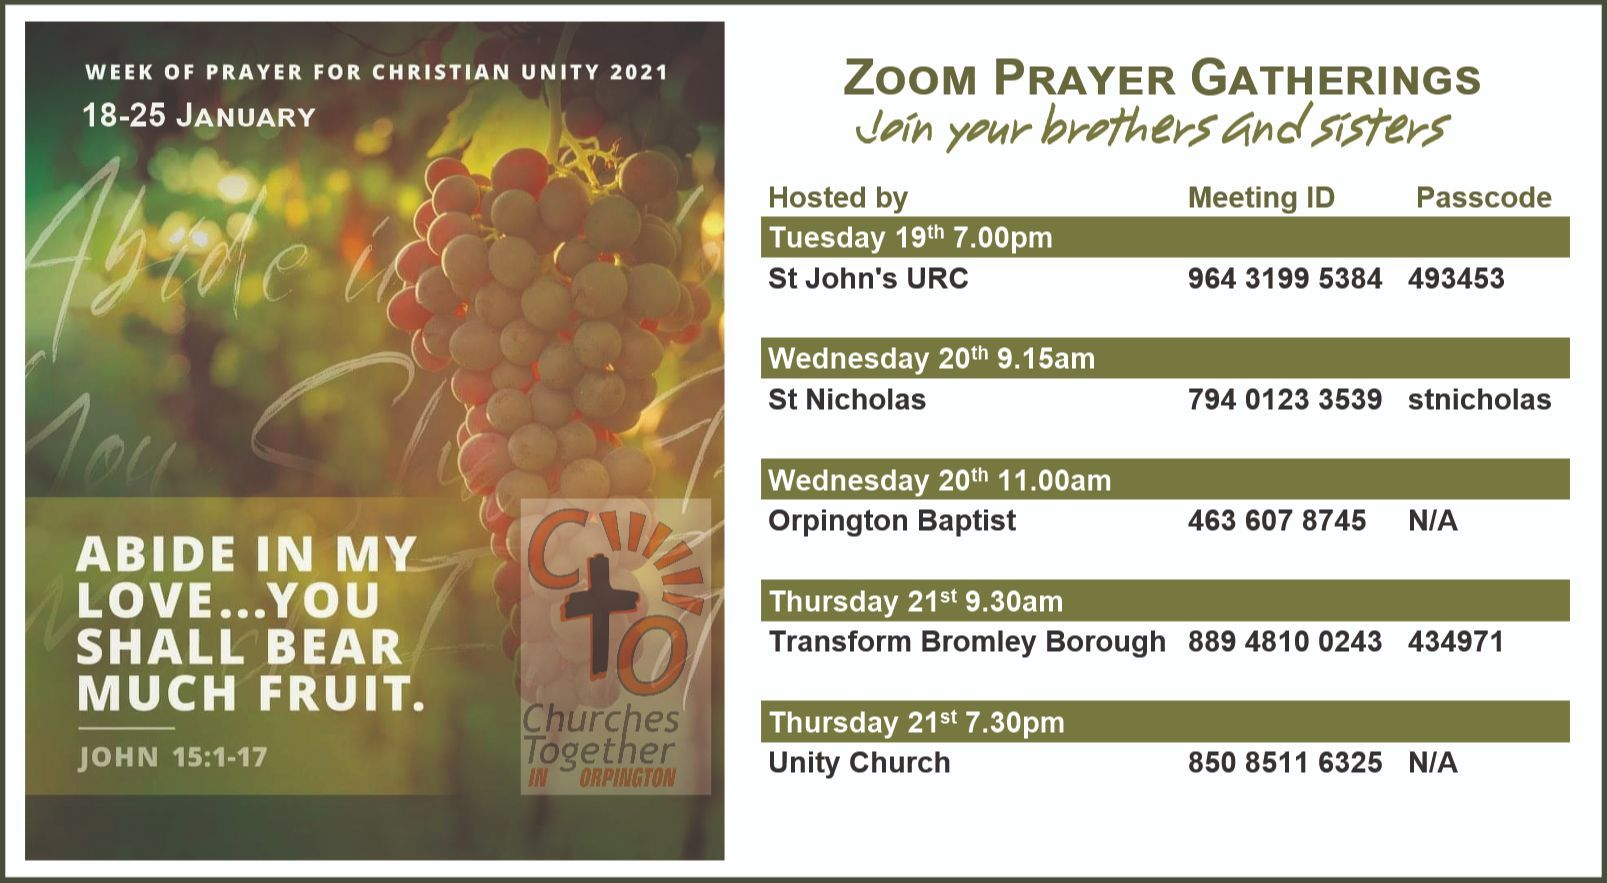 Prayers For Christian Unity - Jan 21